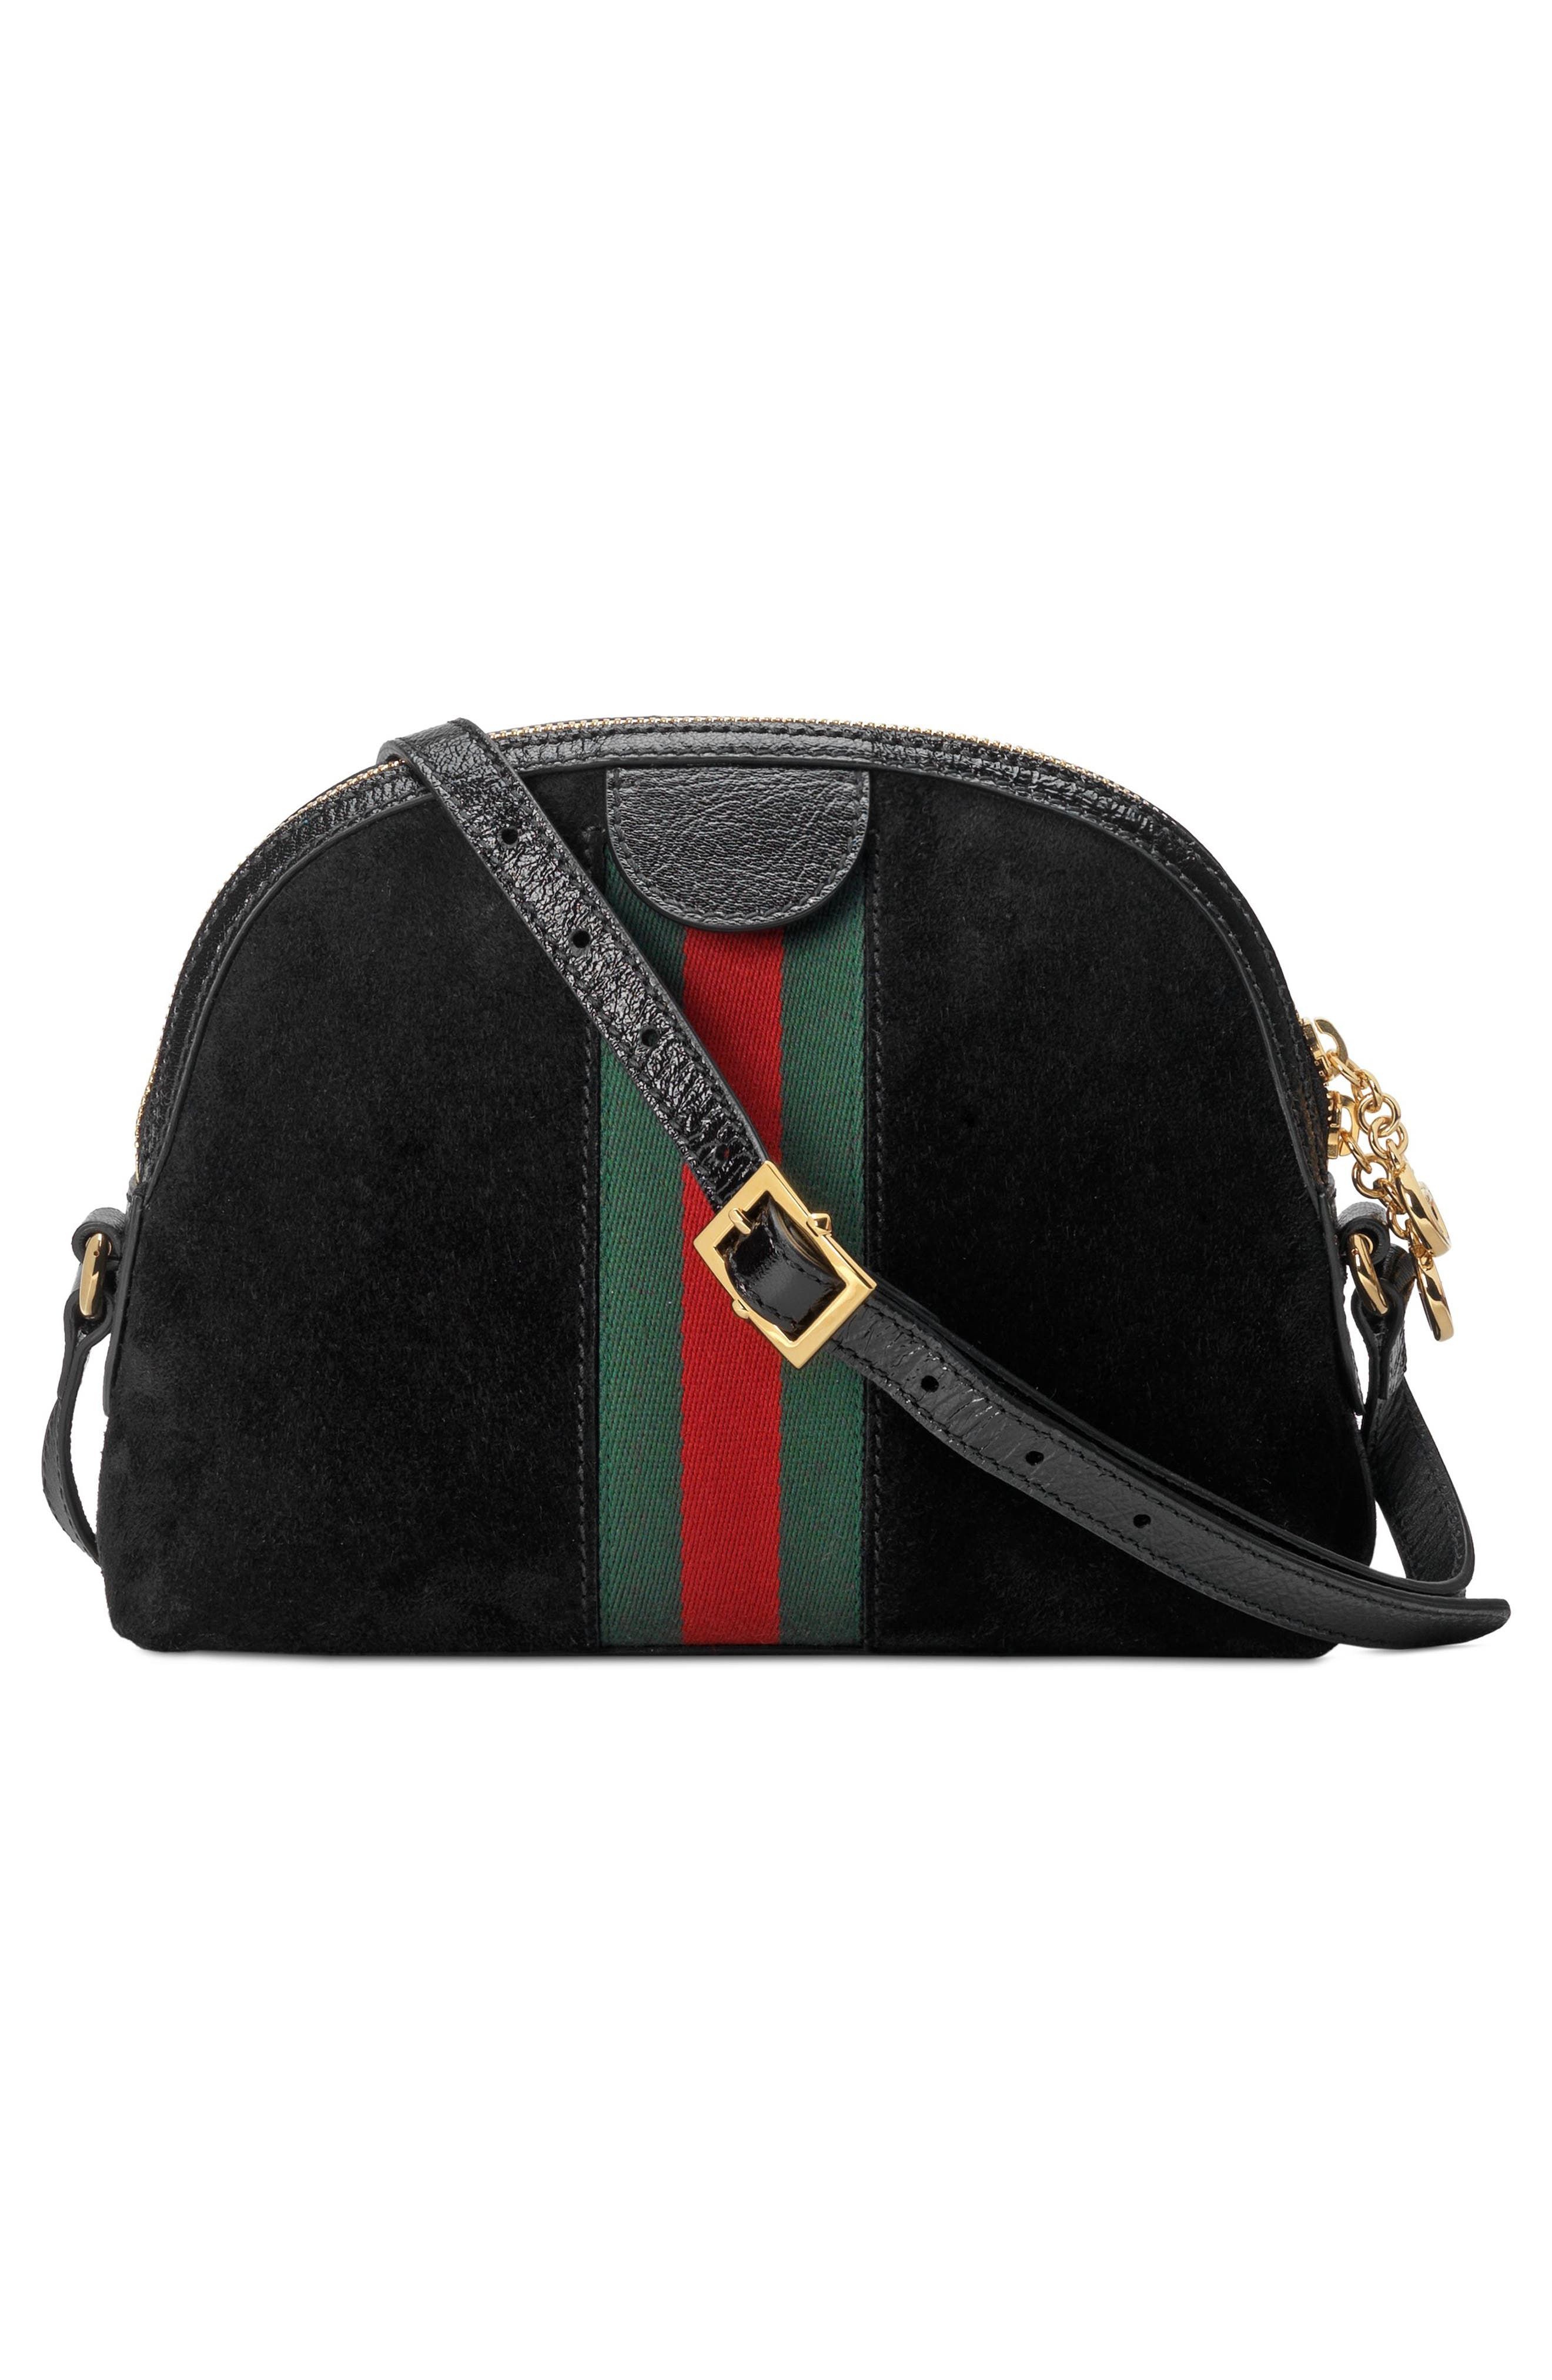 Small Suede Shoulder Bag,                             Alternate thumbnail 2, color,                             NERO/ NERO/ VERT RED VERT